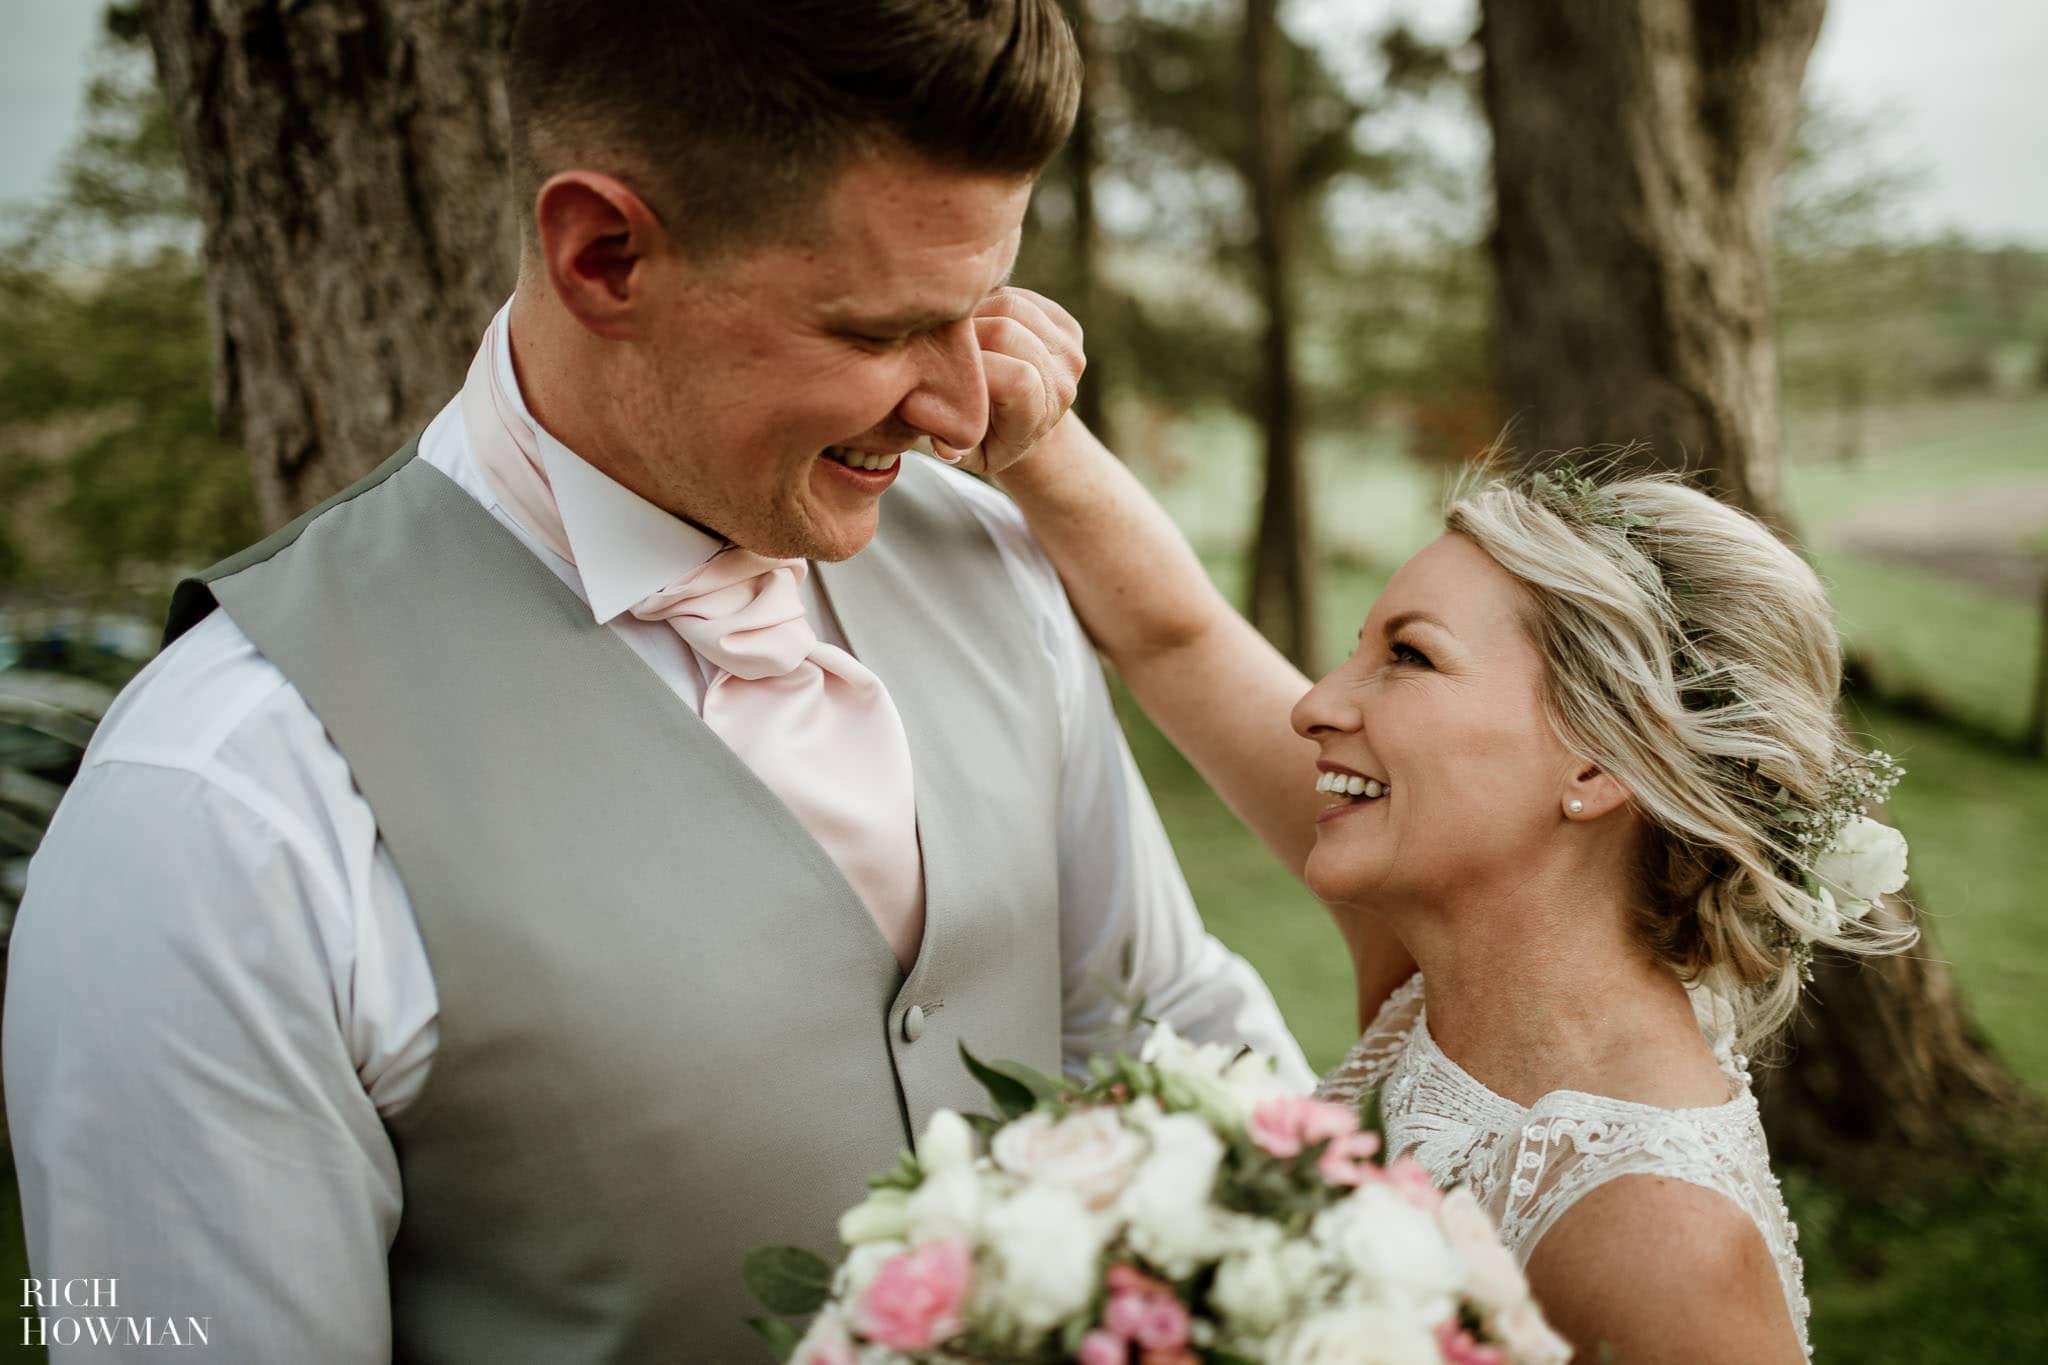 Kingscote Barn Wedding Photographer in Gloucestershire 594